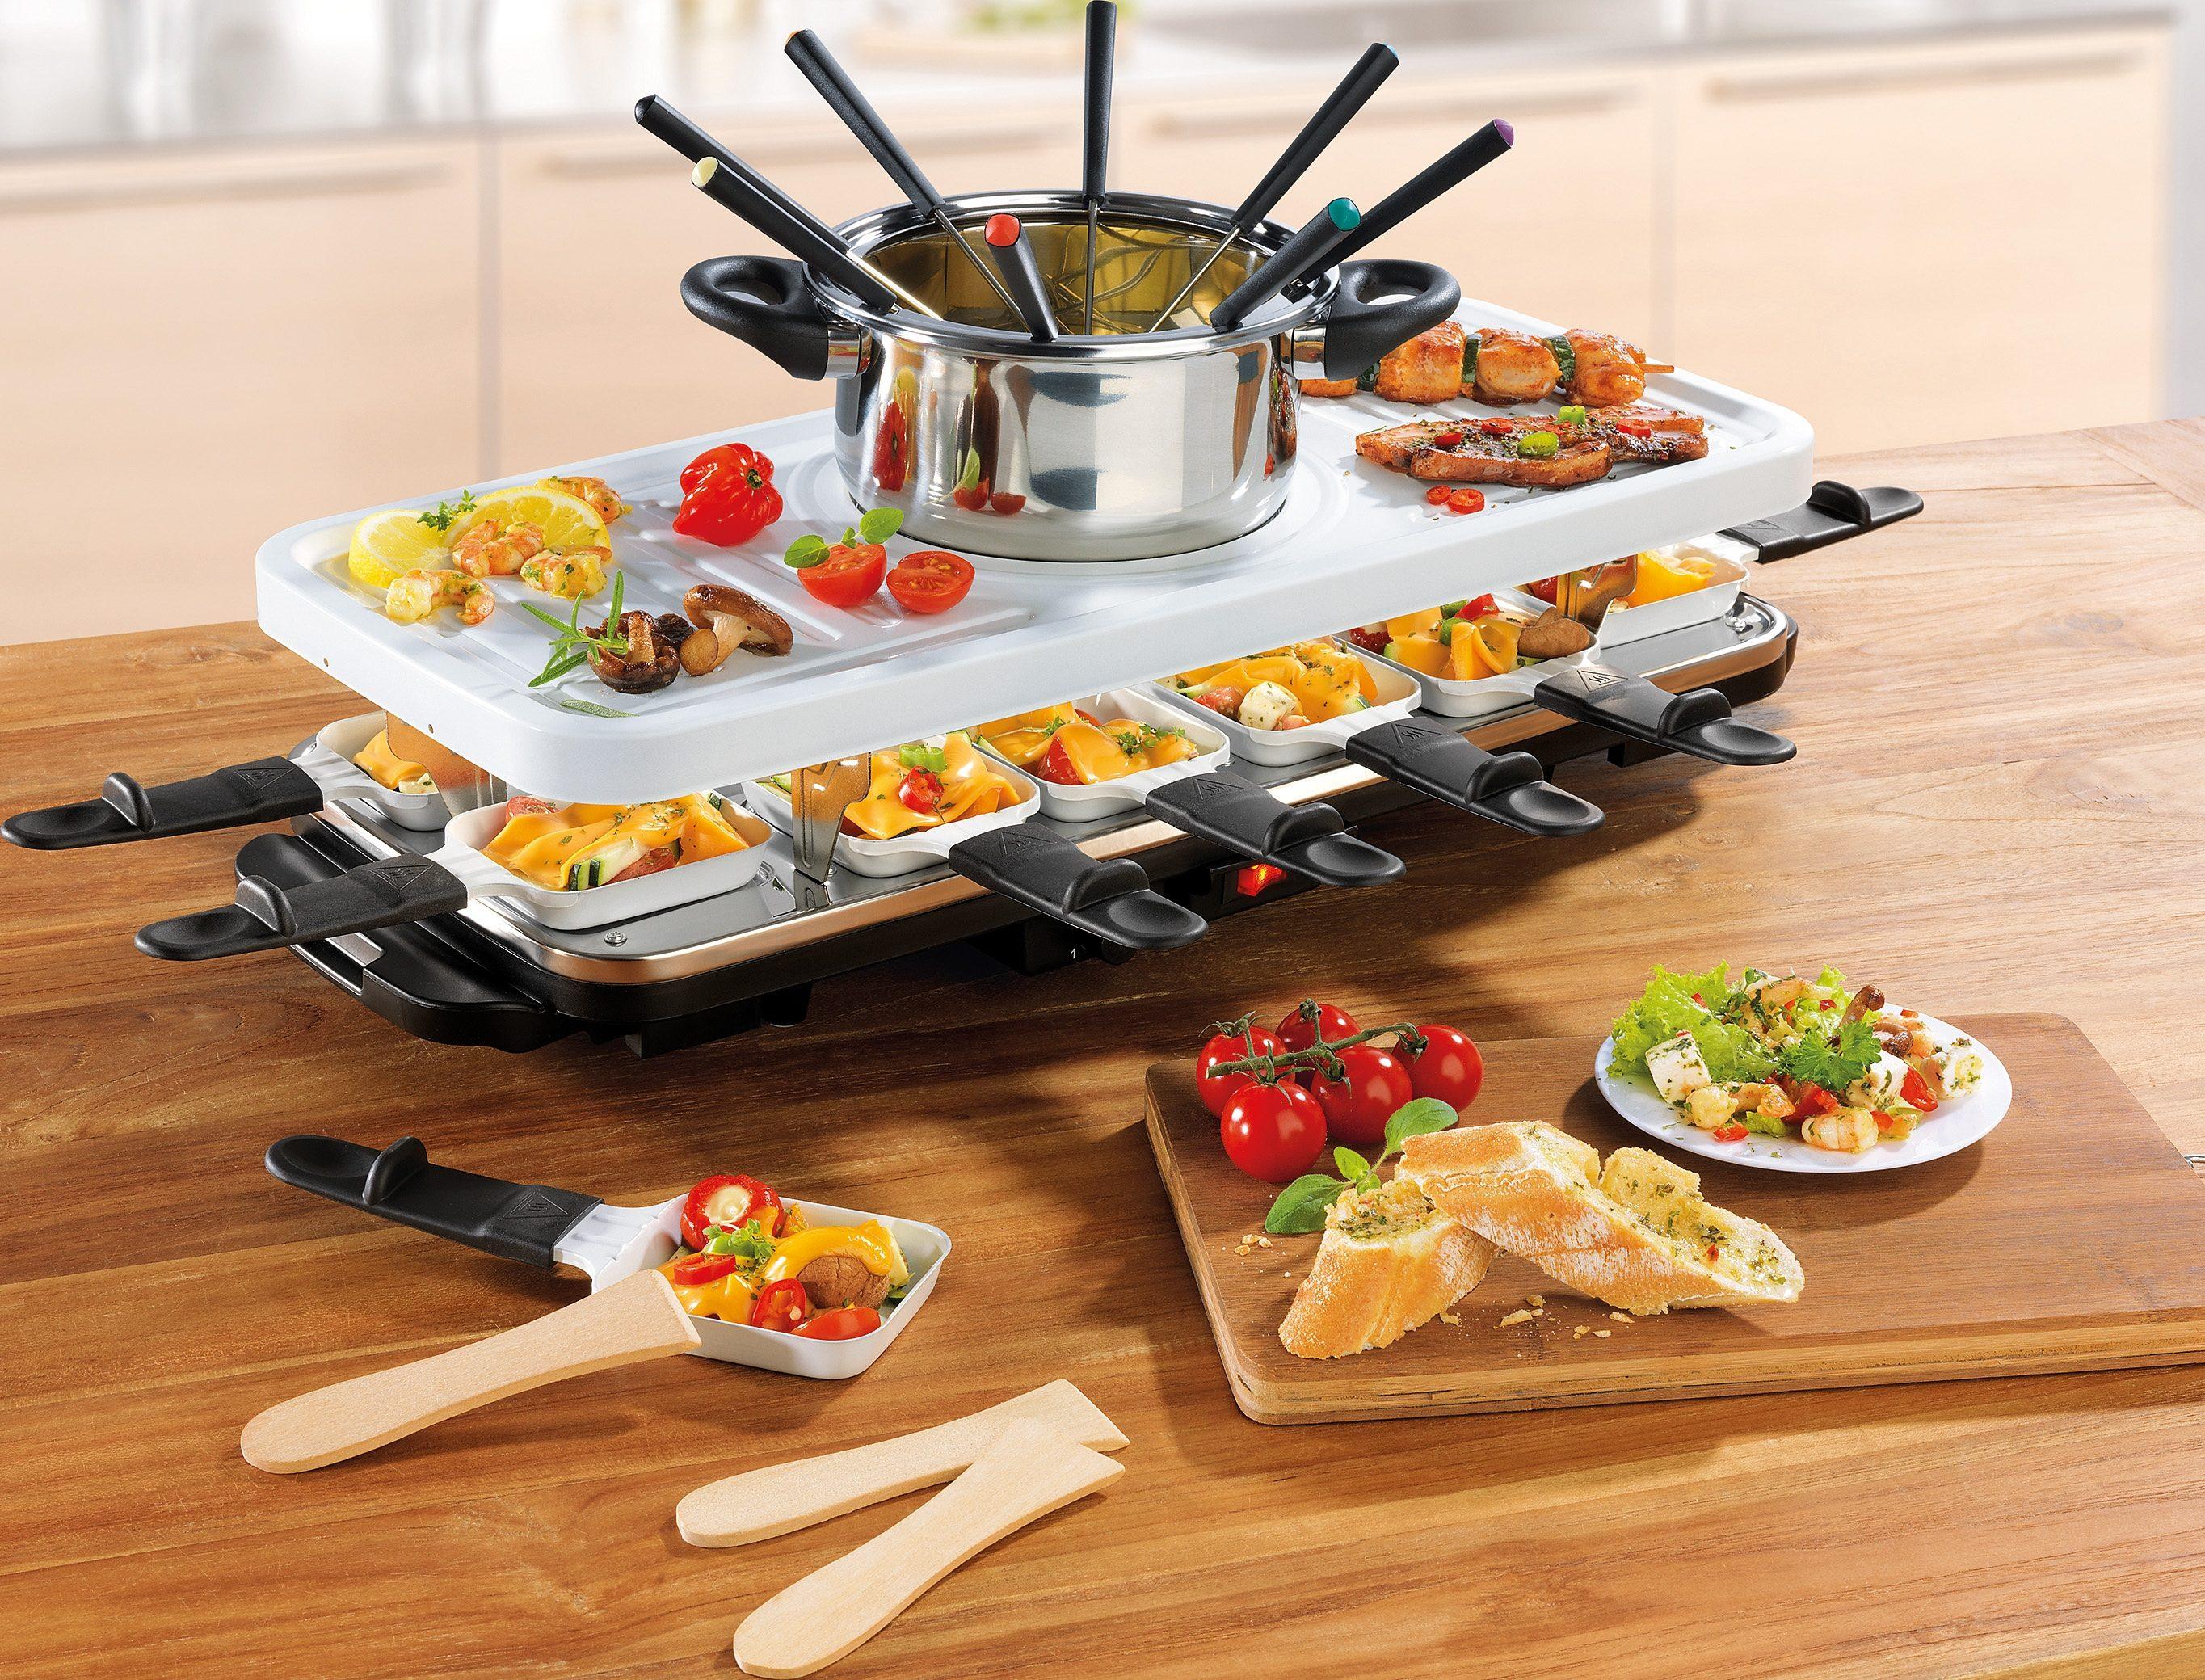 gourmetmaxx raclette und fondue set raclette und fondue set 12 raclettepfannchen 1600 w online kaufen otto